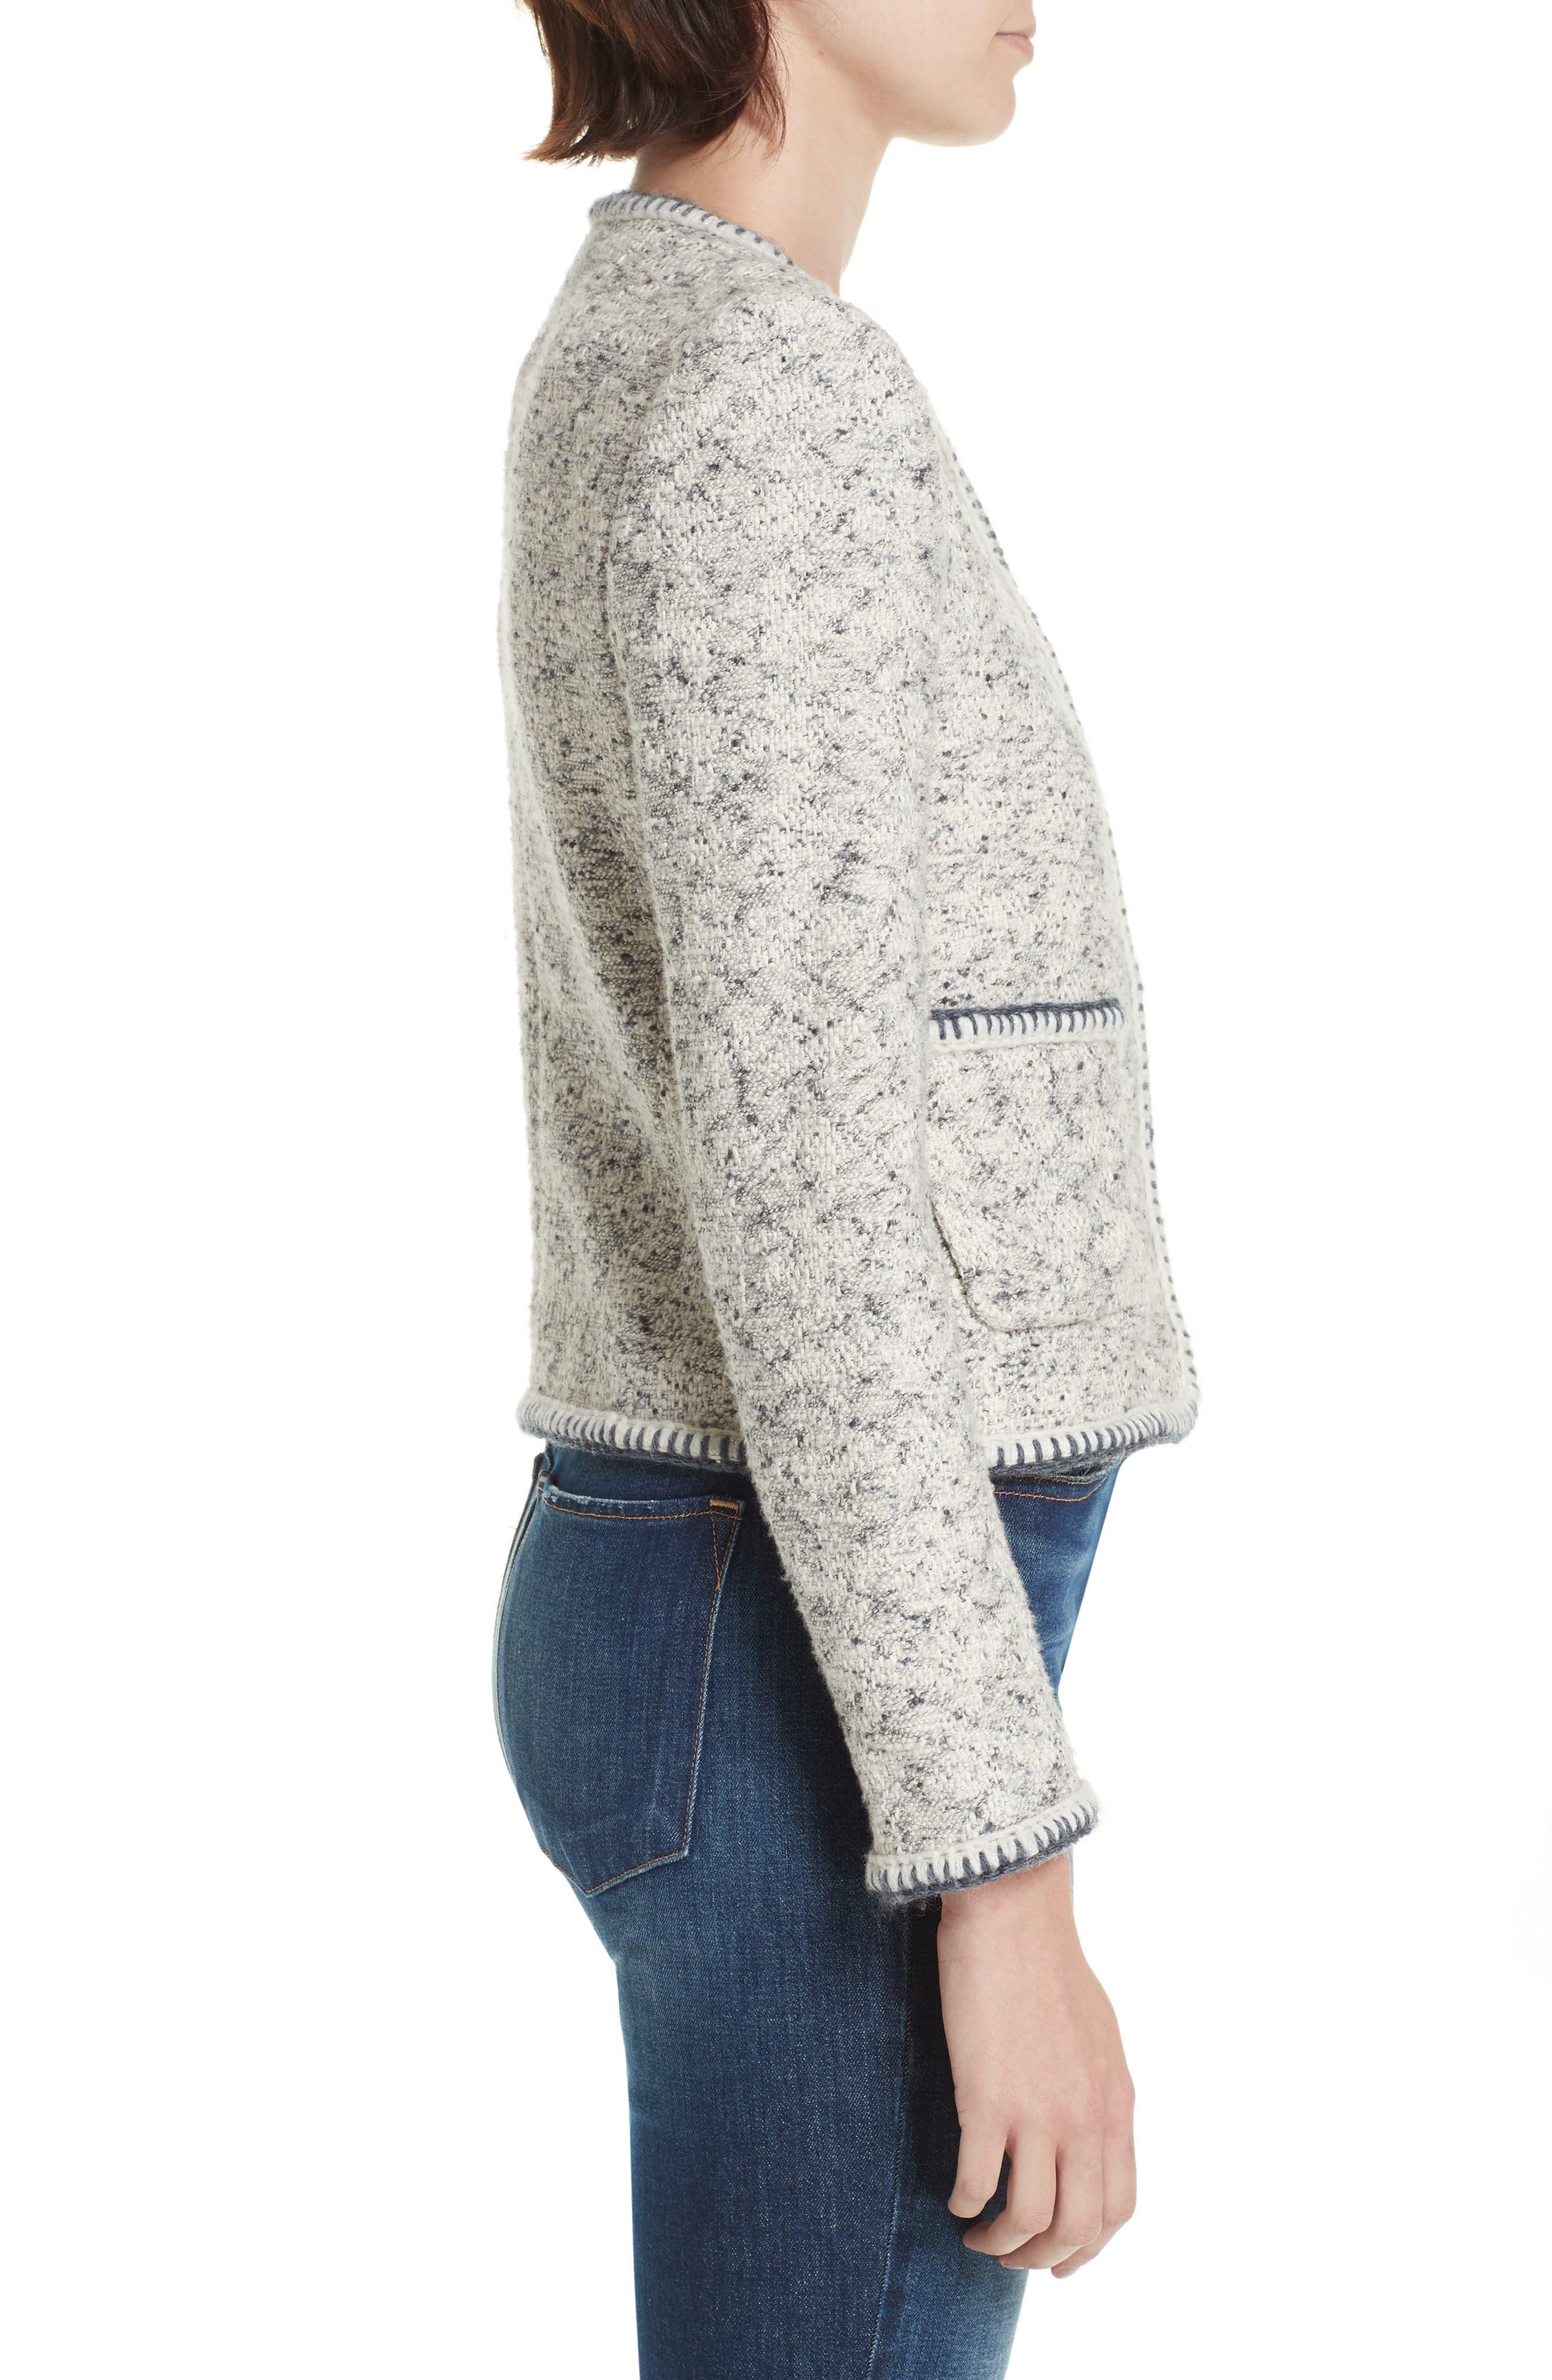 Speckled Tweed Jacket,                             Alternate thumbnail 3, color,                             054